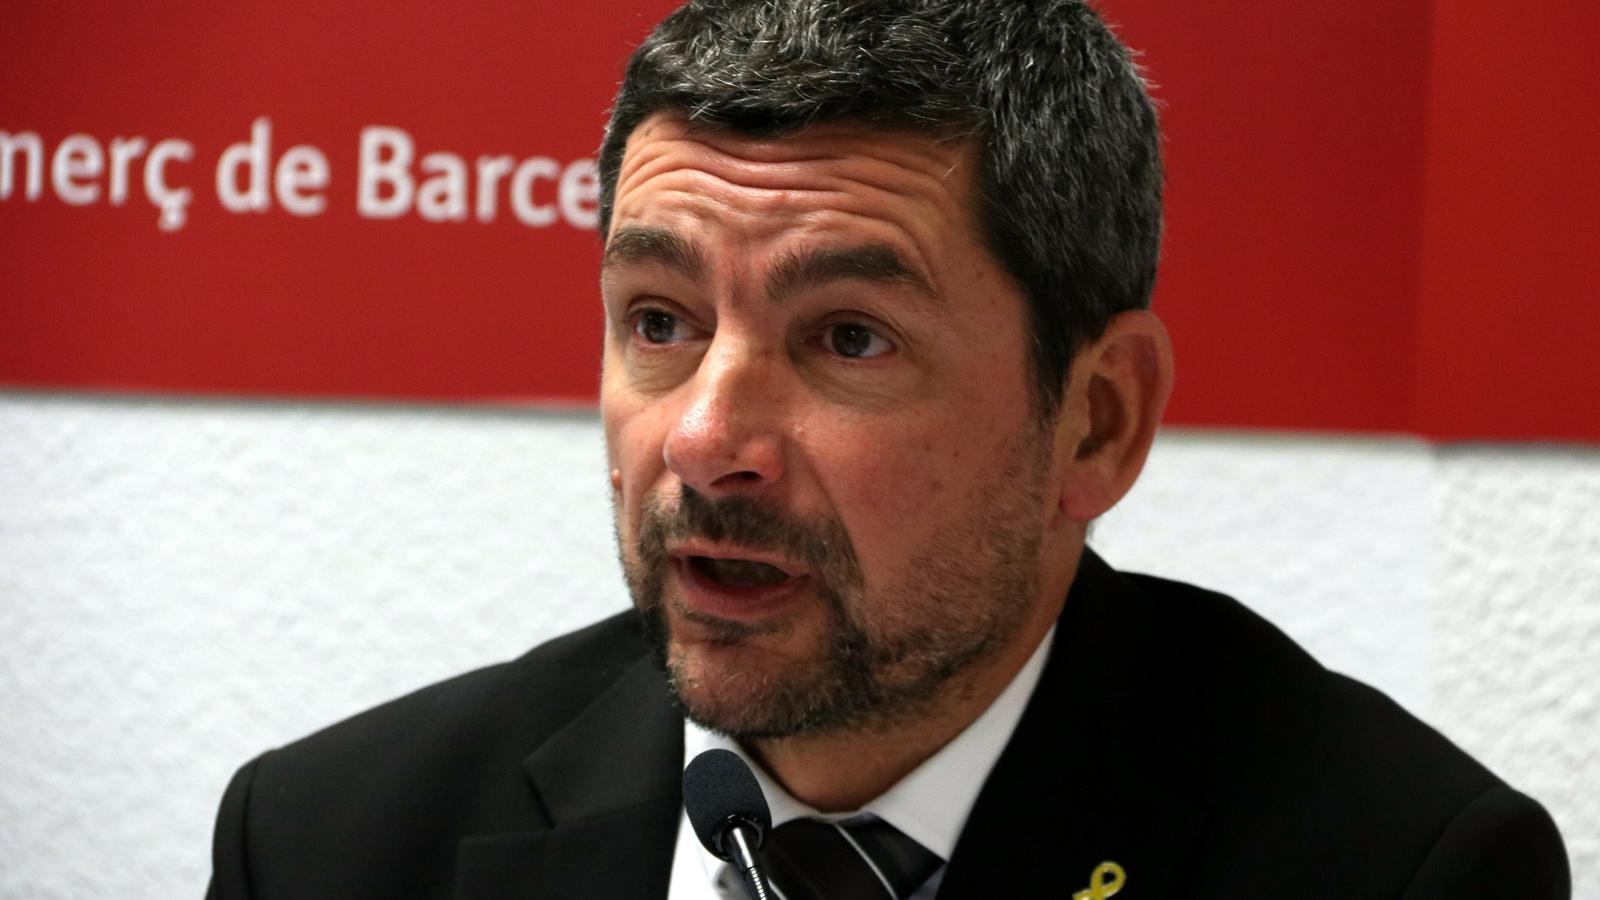 El president de la Cambra de Comerç de Barcelona, Joan Canadell.